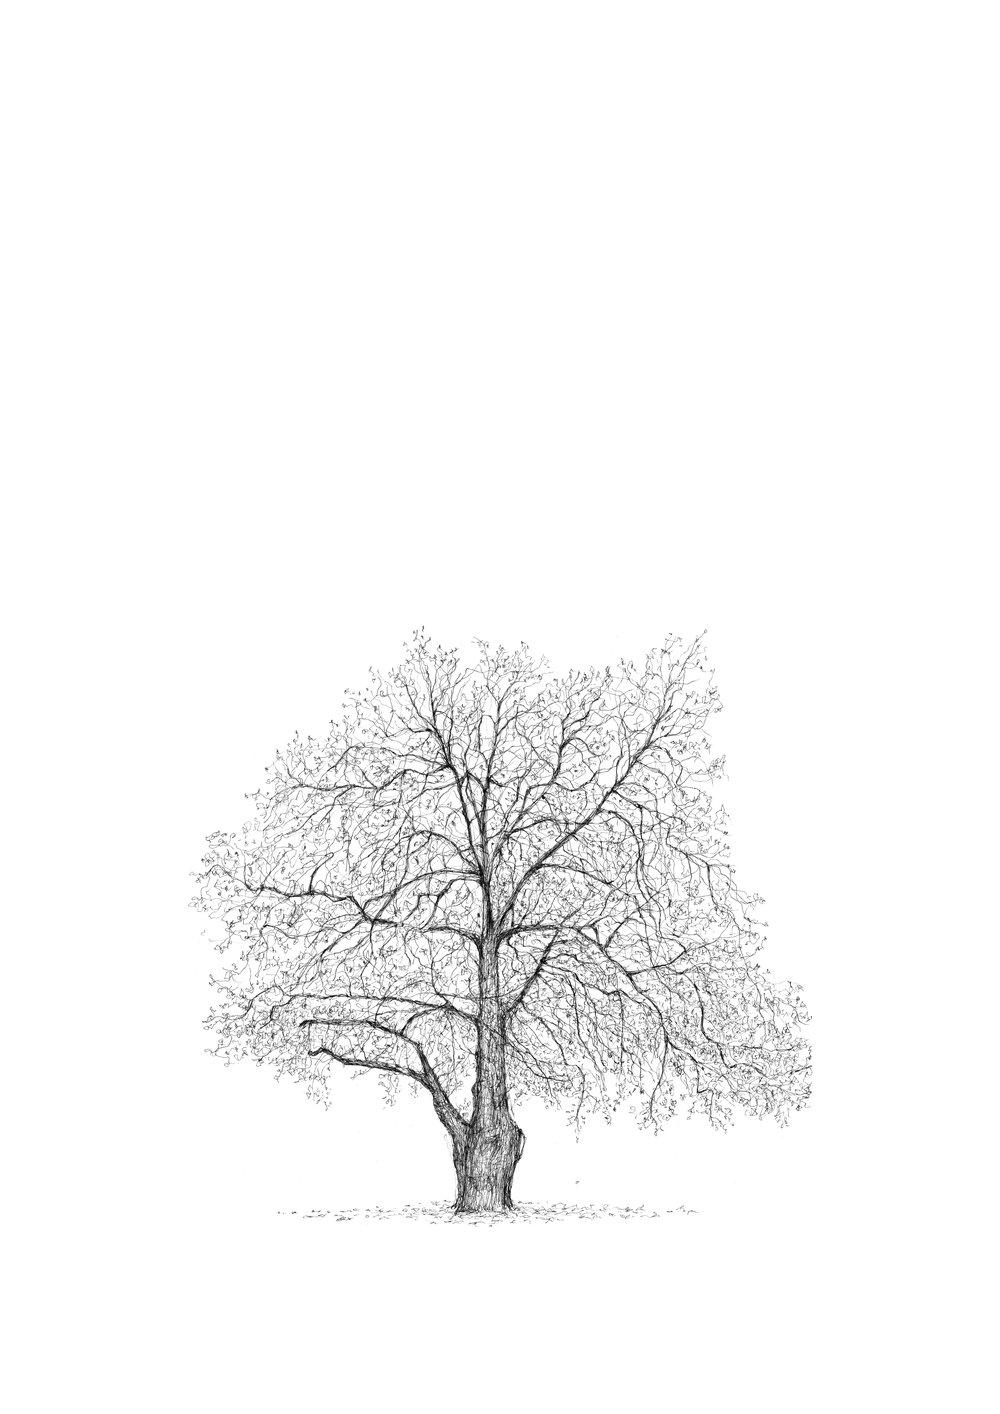 Berkeley Square plane - the Great Trees of London - Luke Adam Hawker